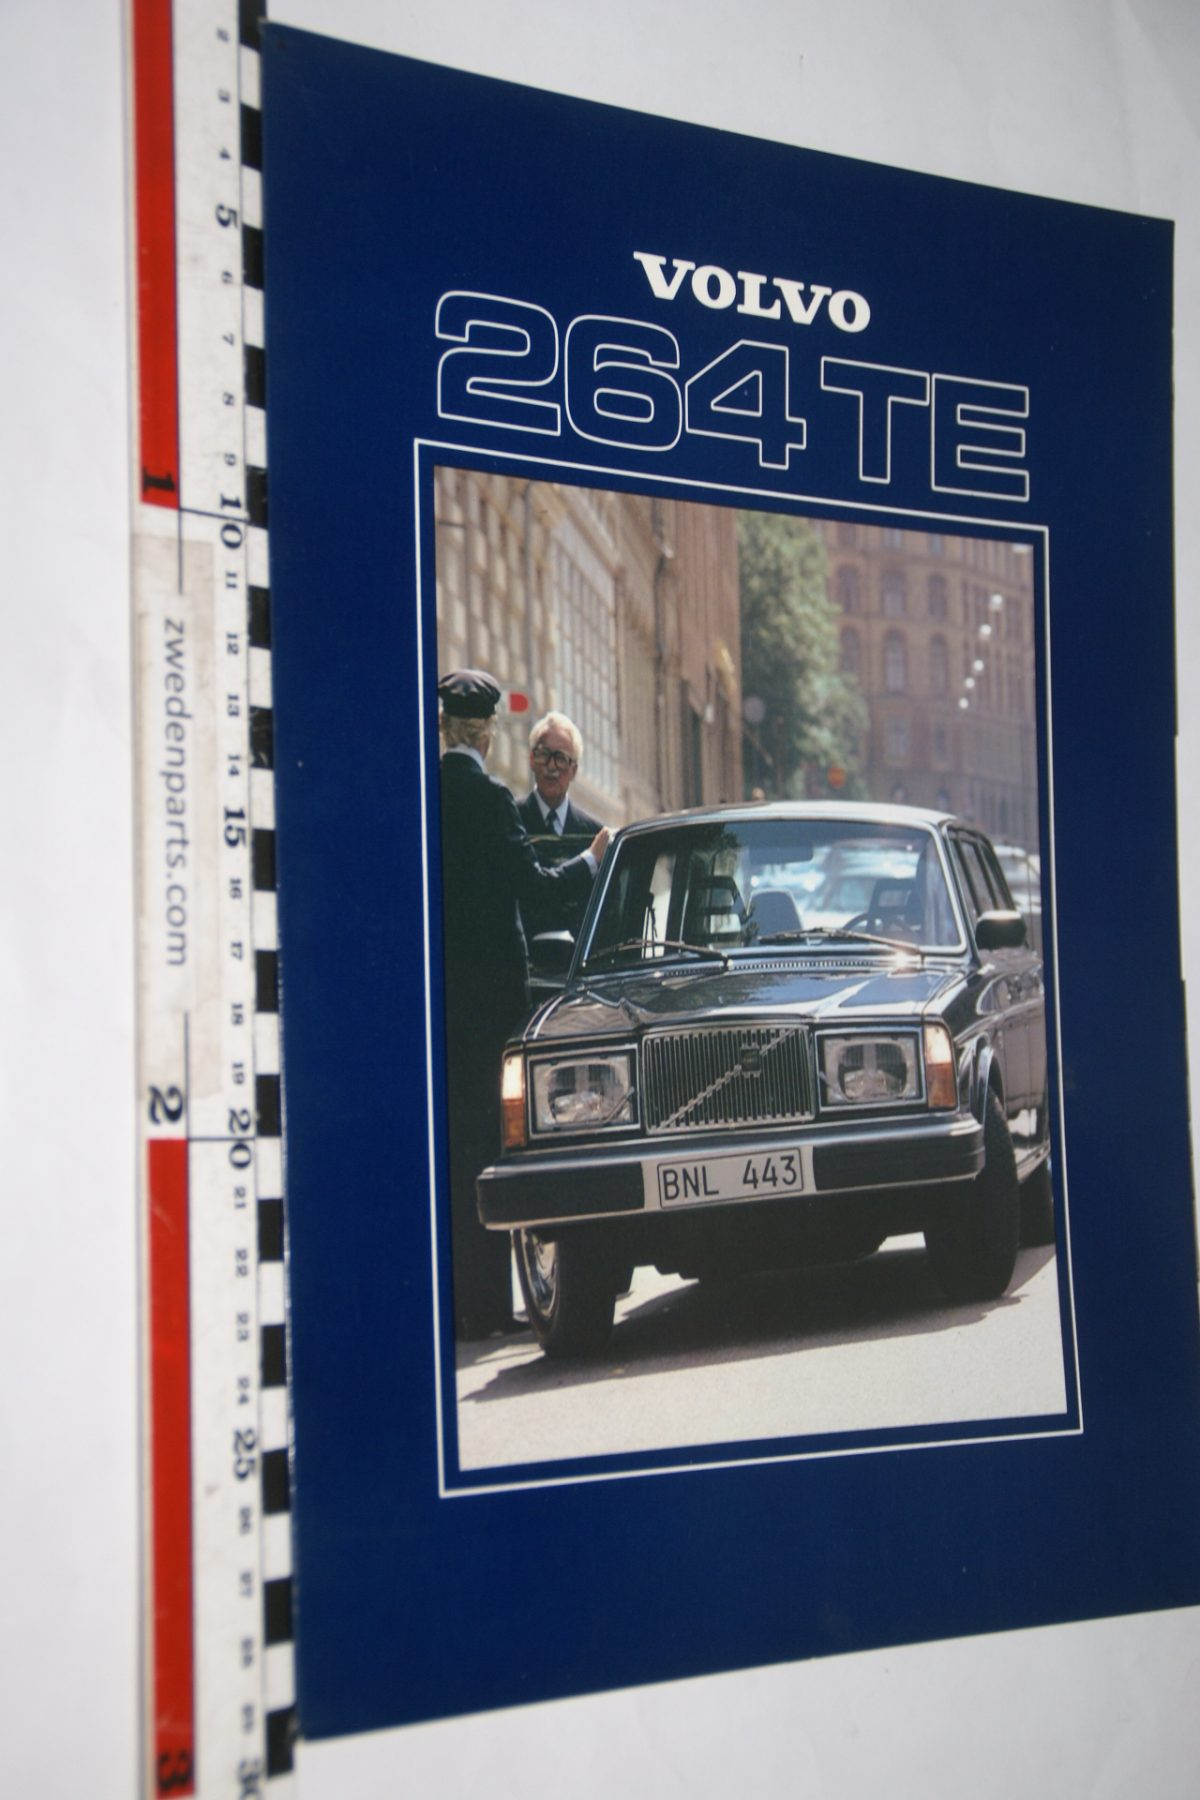 DSC05570 1979 brochure Volvo 264 TE nr ASP-PV 6818 Engels